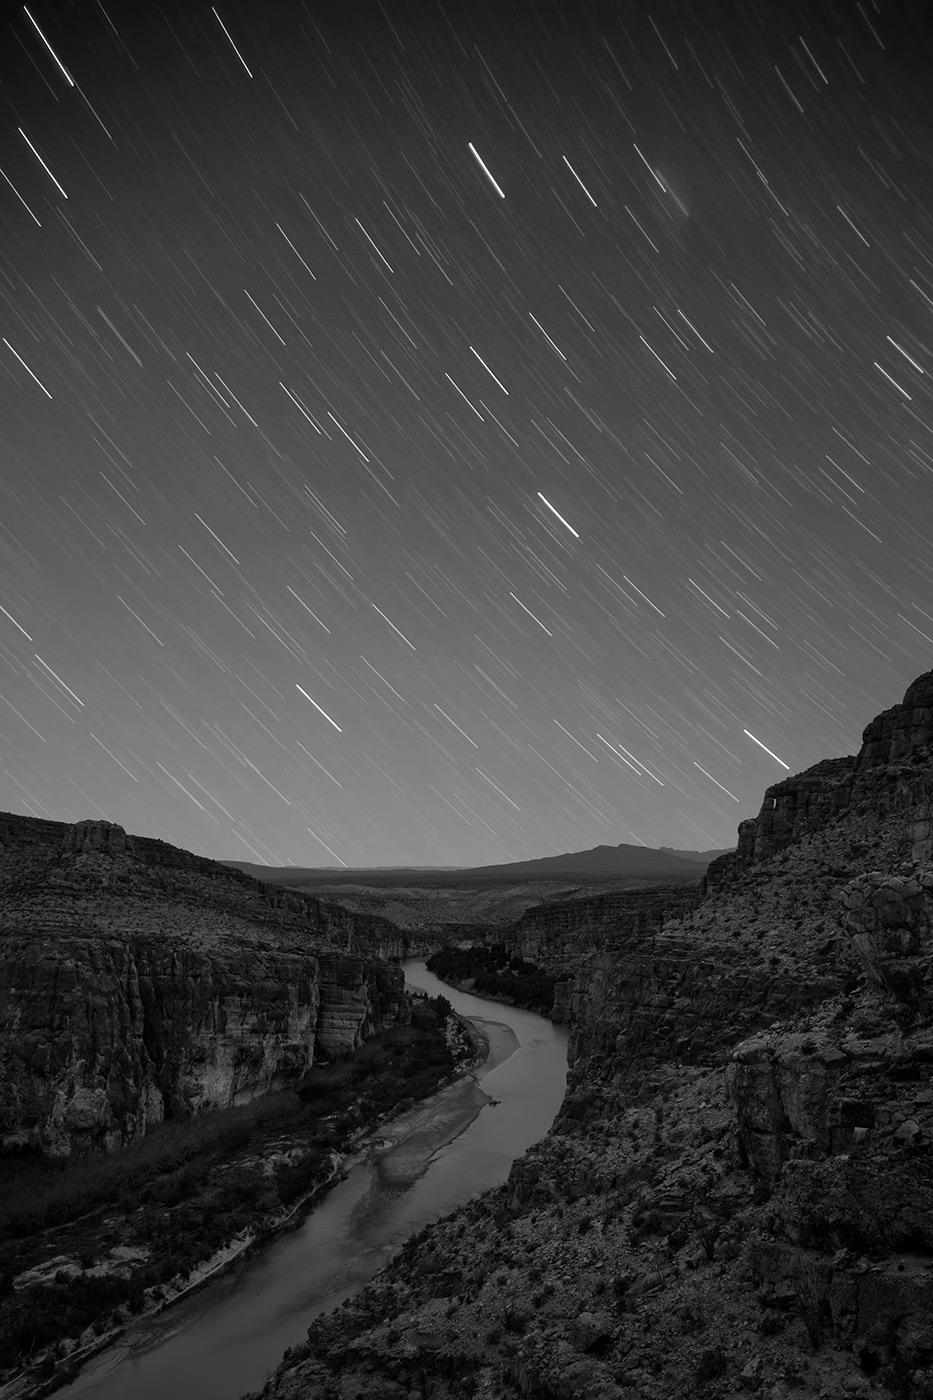 West-Texas-ABP-Hot-Springs-Canyon_stars.jpg